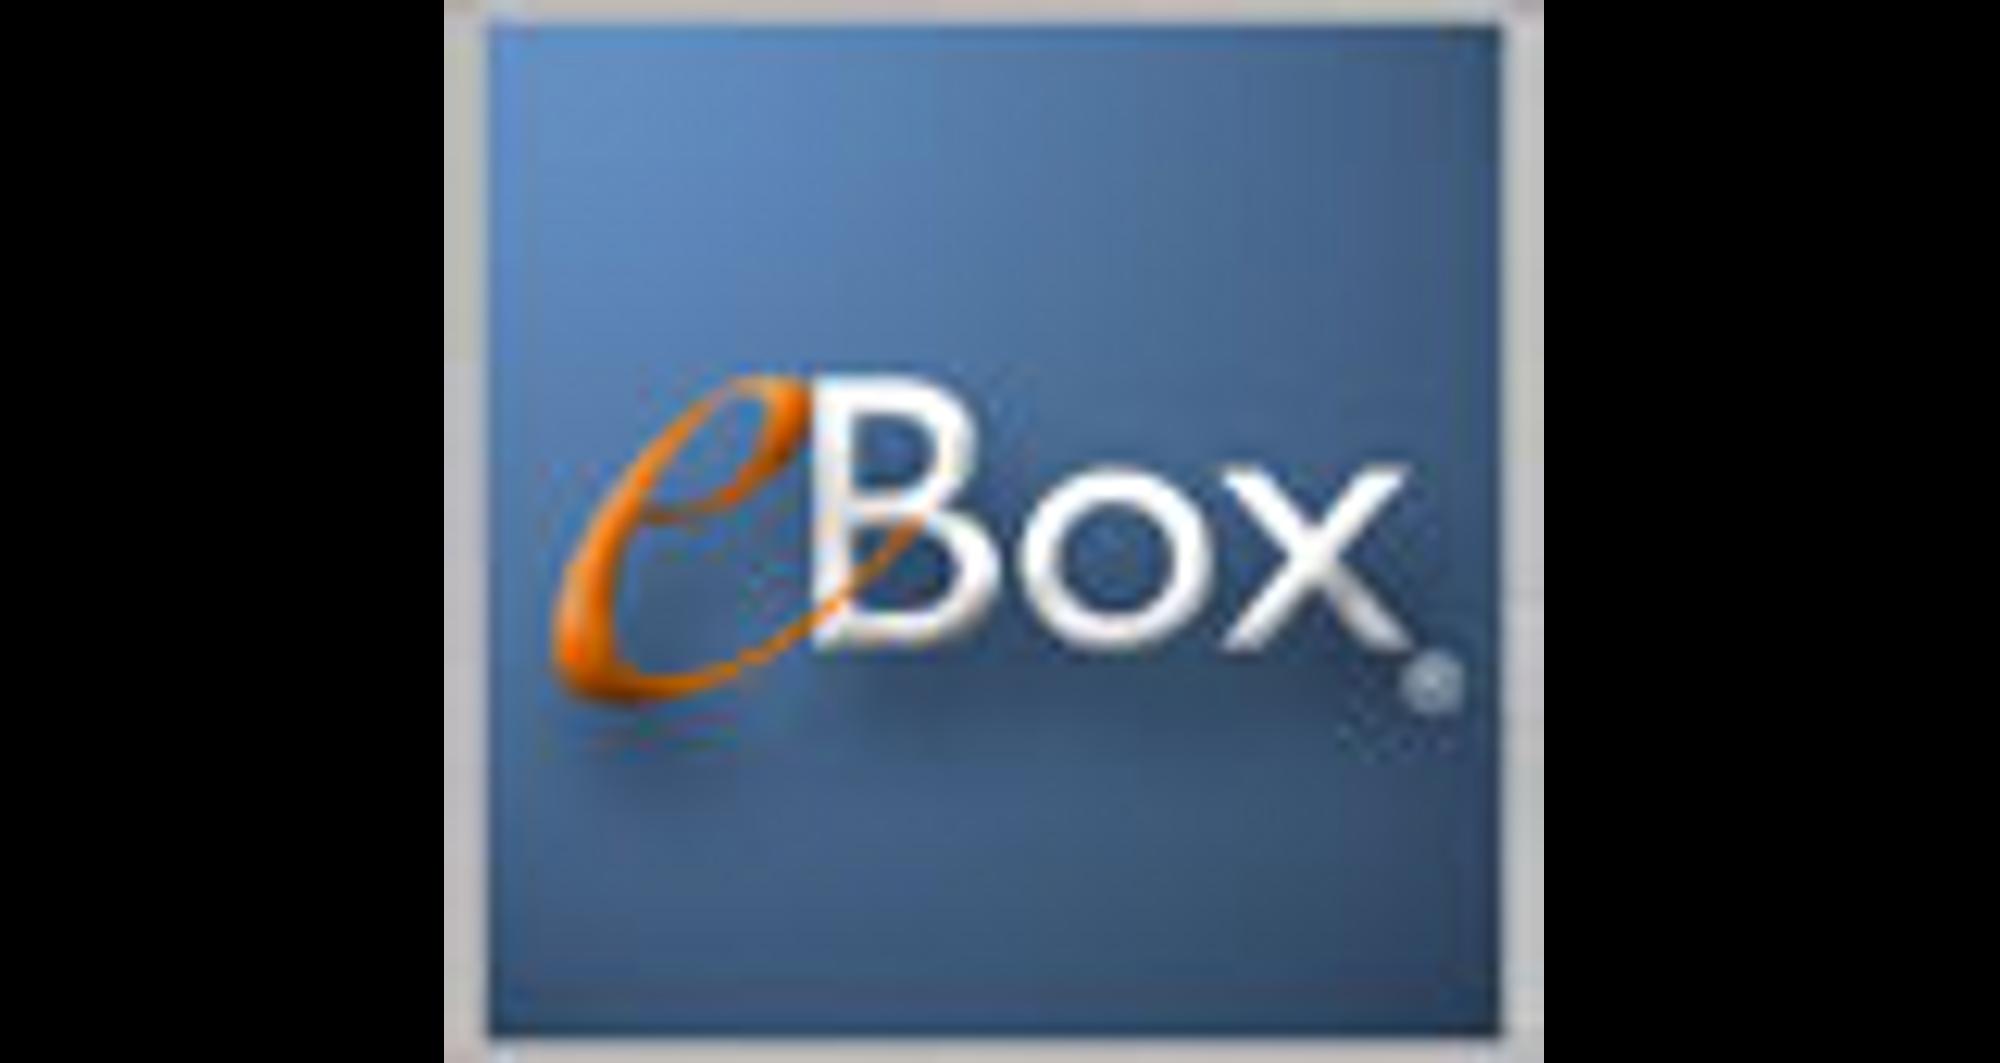 Ebox.no